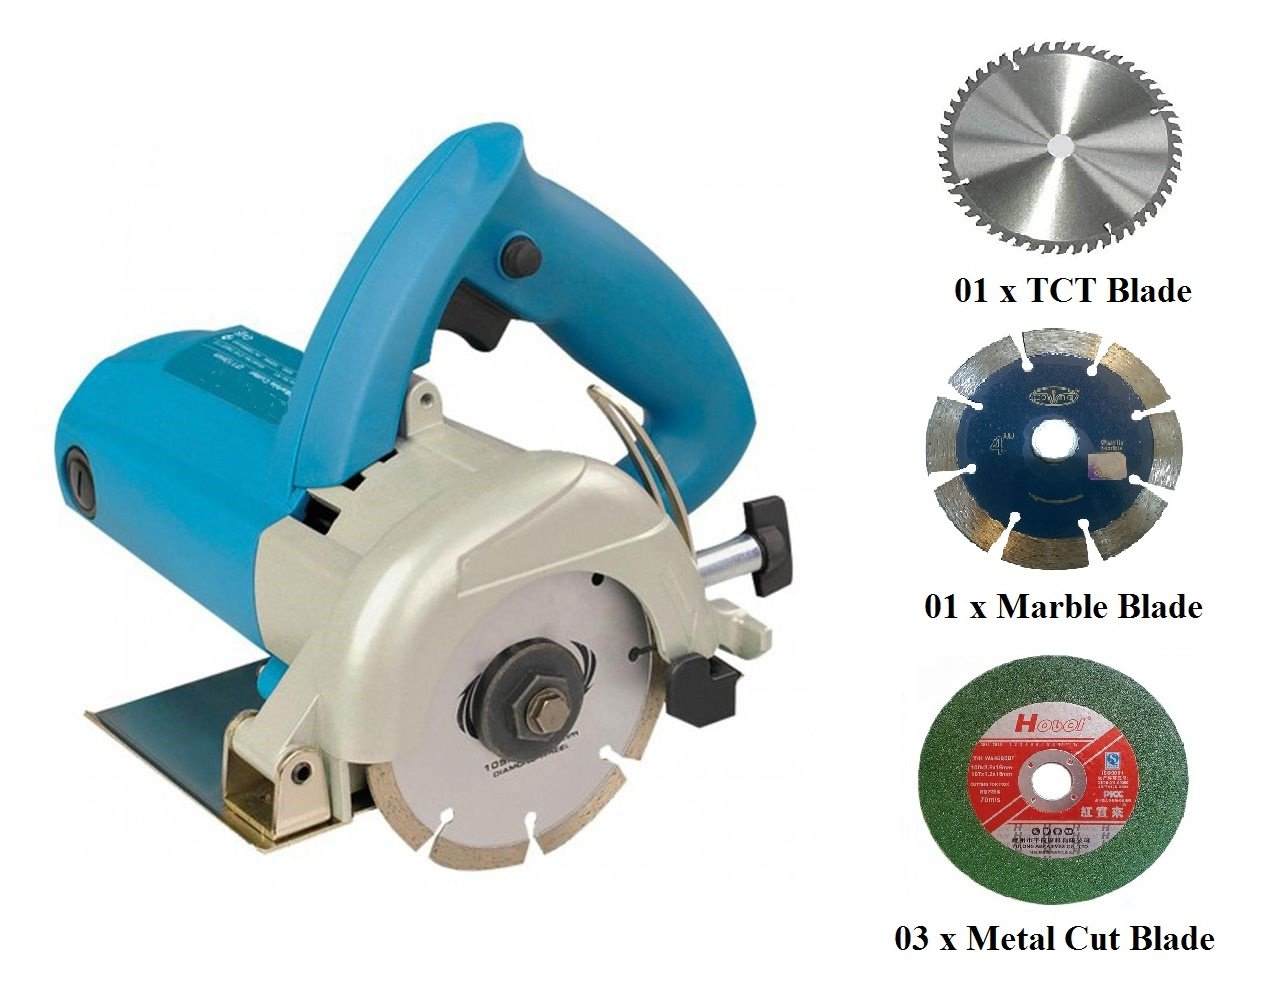 DIY Engineers Heavy Duty 4 Inch Marble/Wood/Iron Cutter Machine